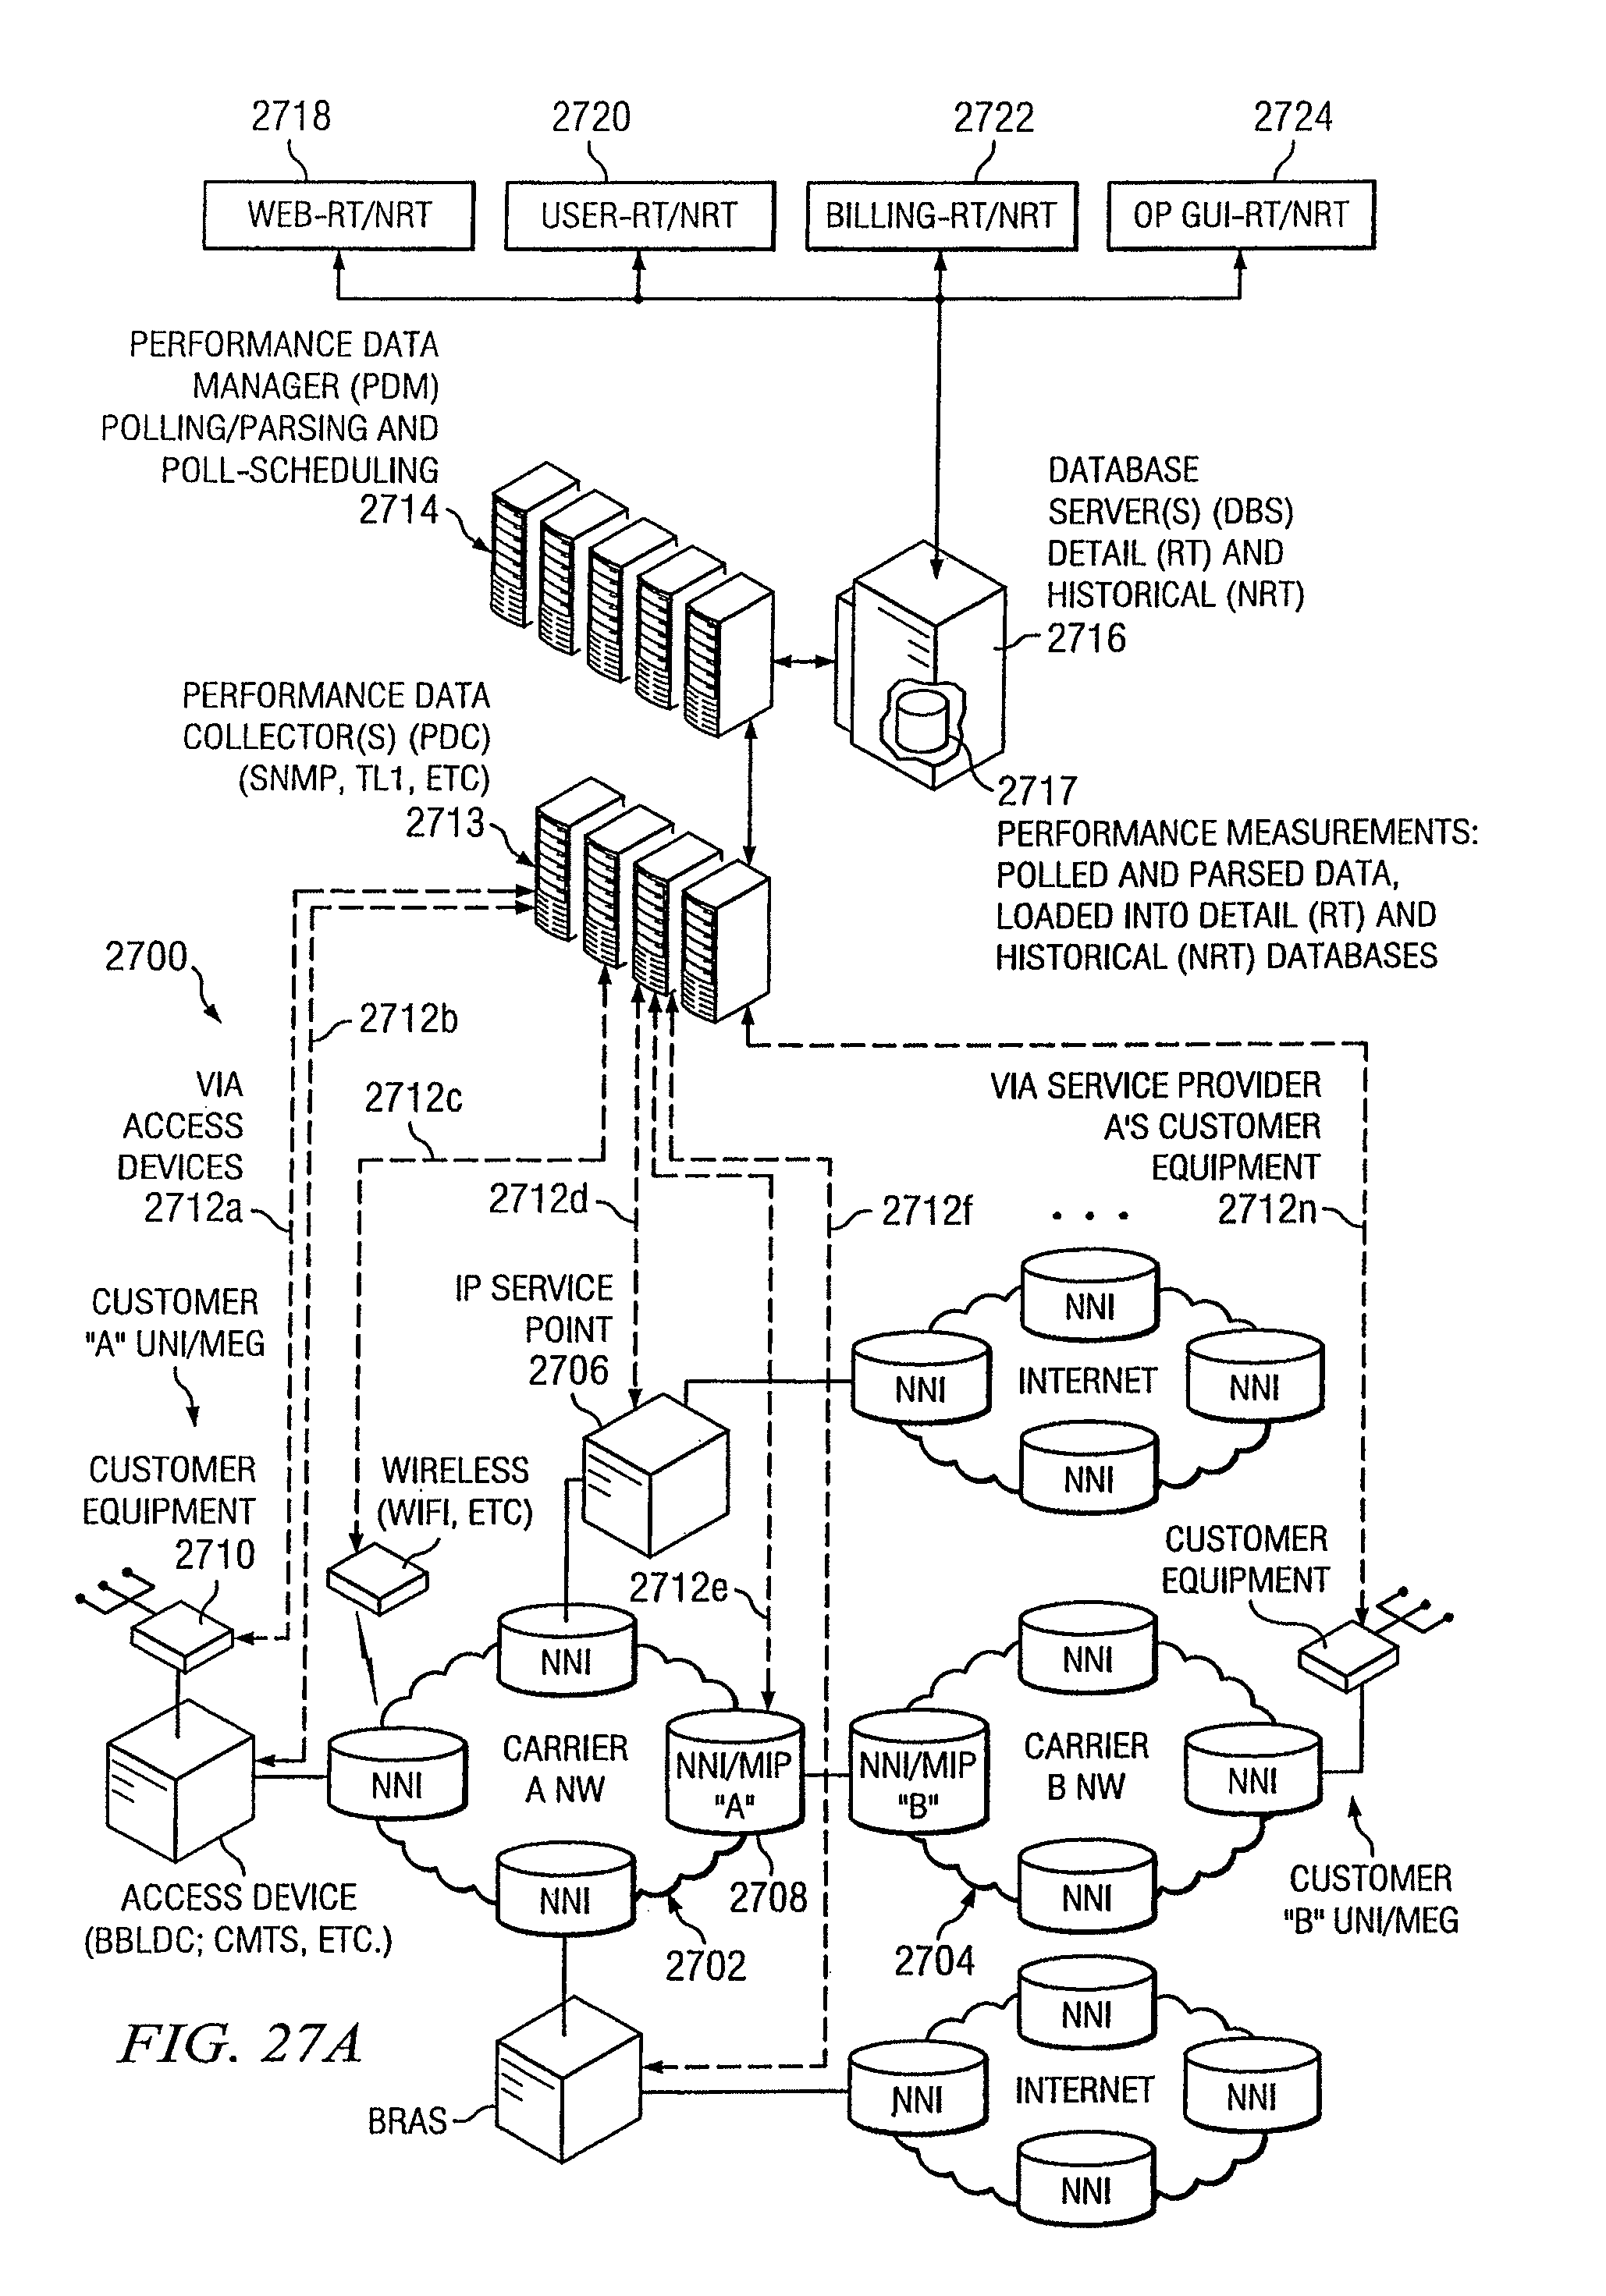 Patent US 9,118,583 B2